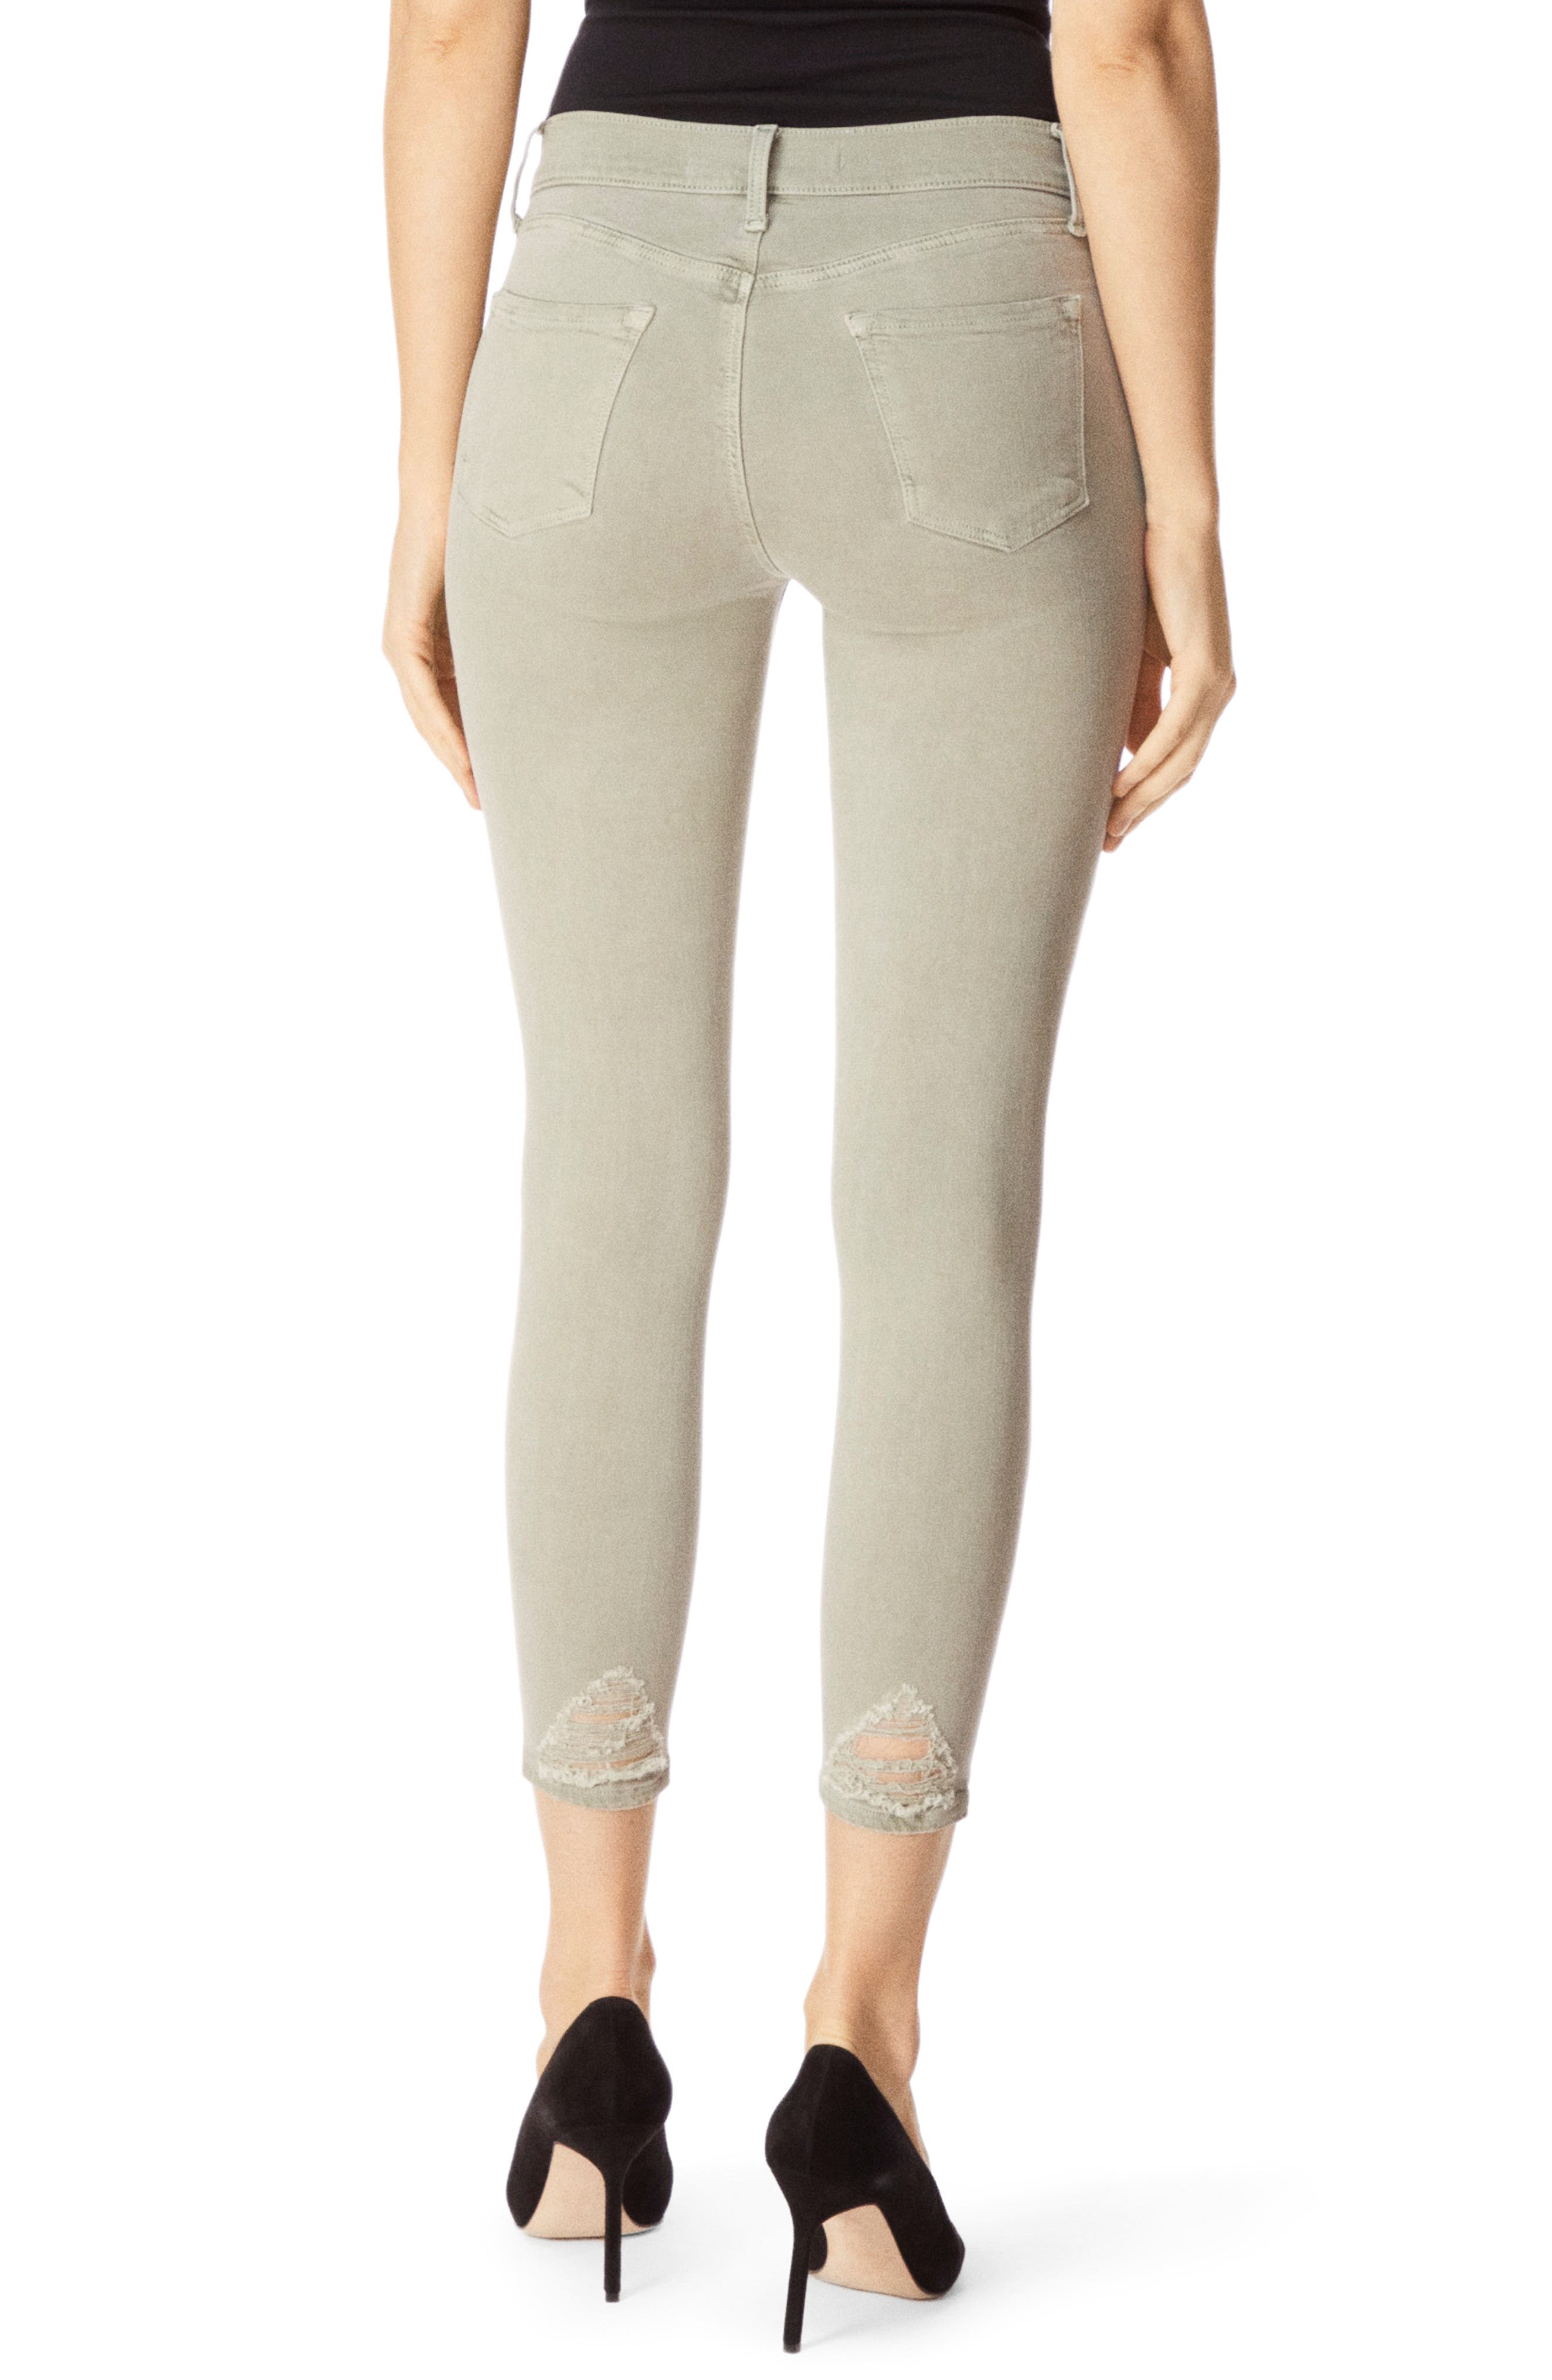 J BRAND, 835 Capri Skinny Jeans, Alternate thumbnail 2, color, FADED GIBSON DESTRUCT